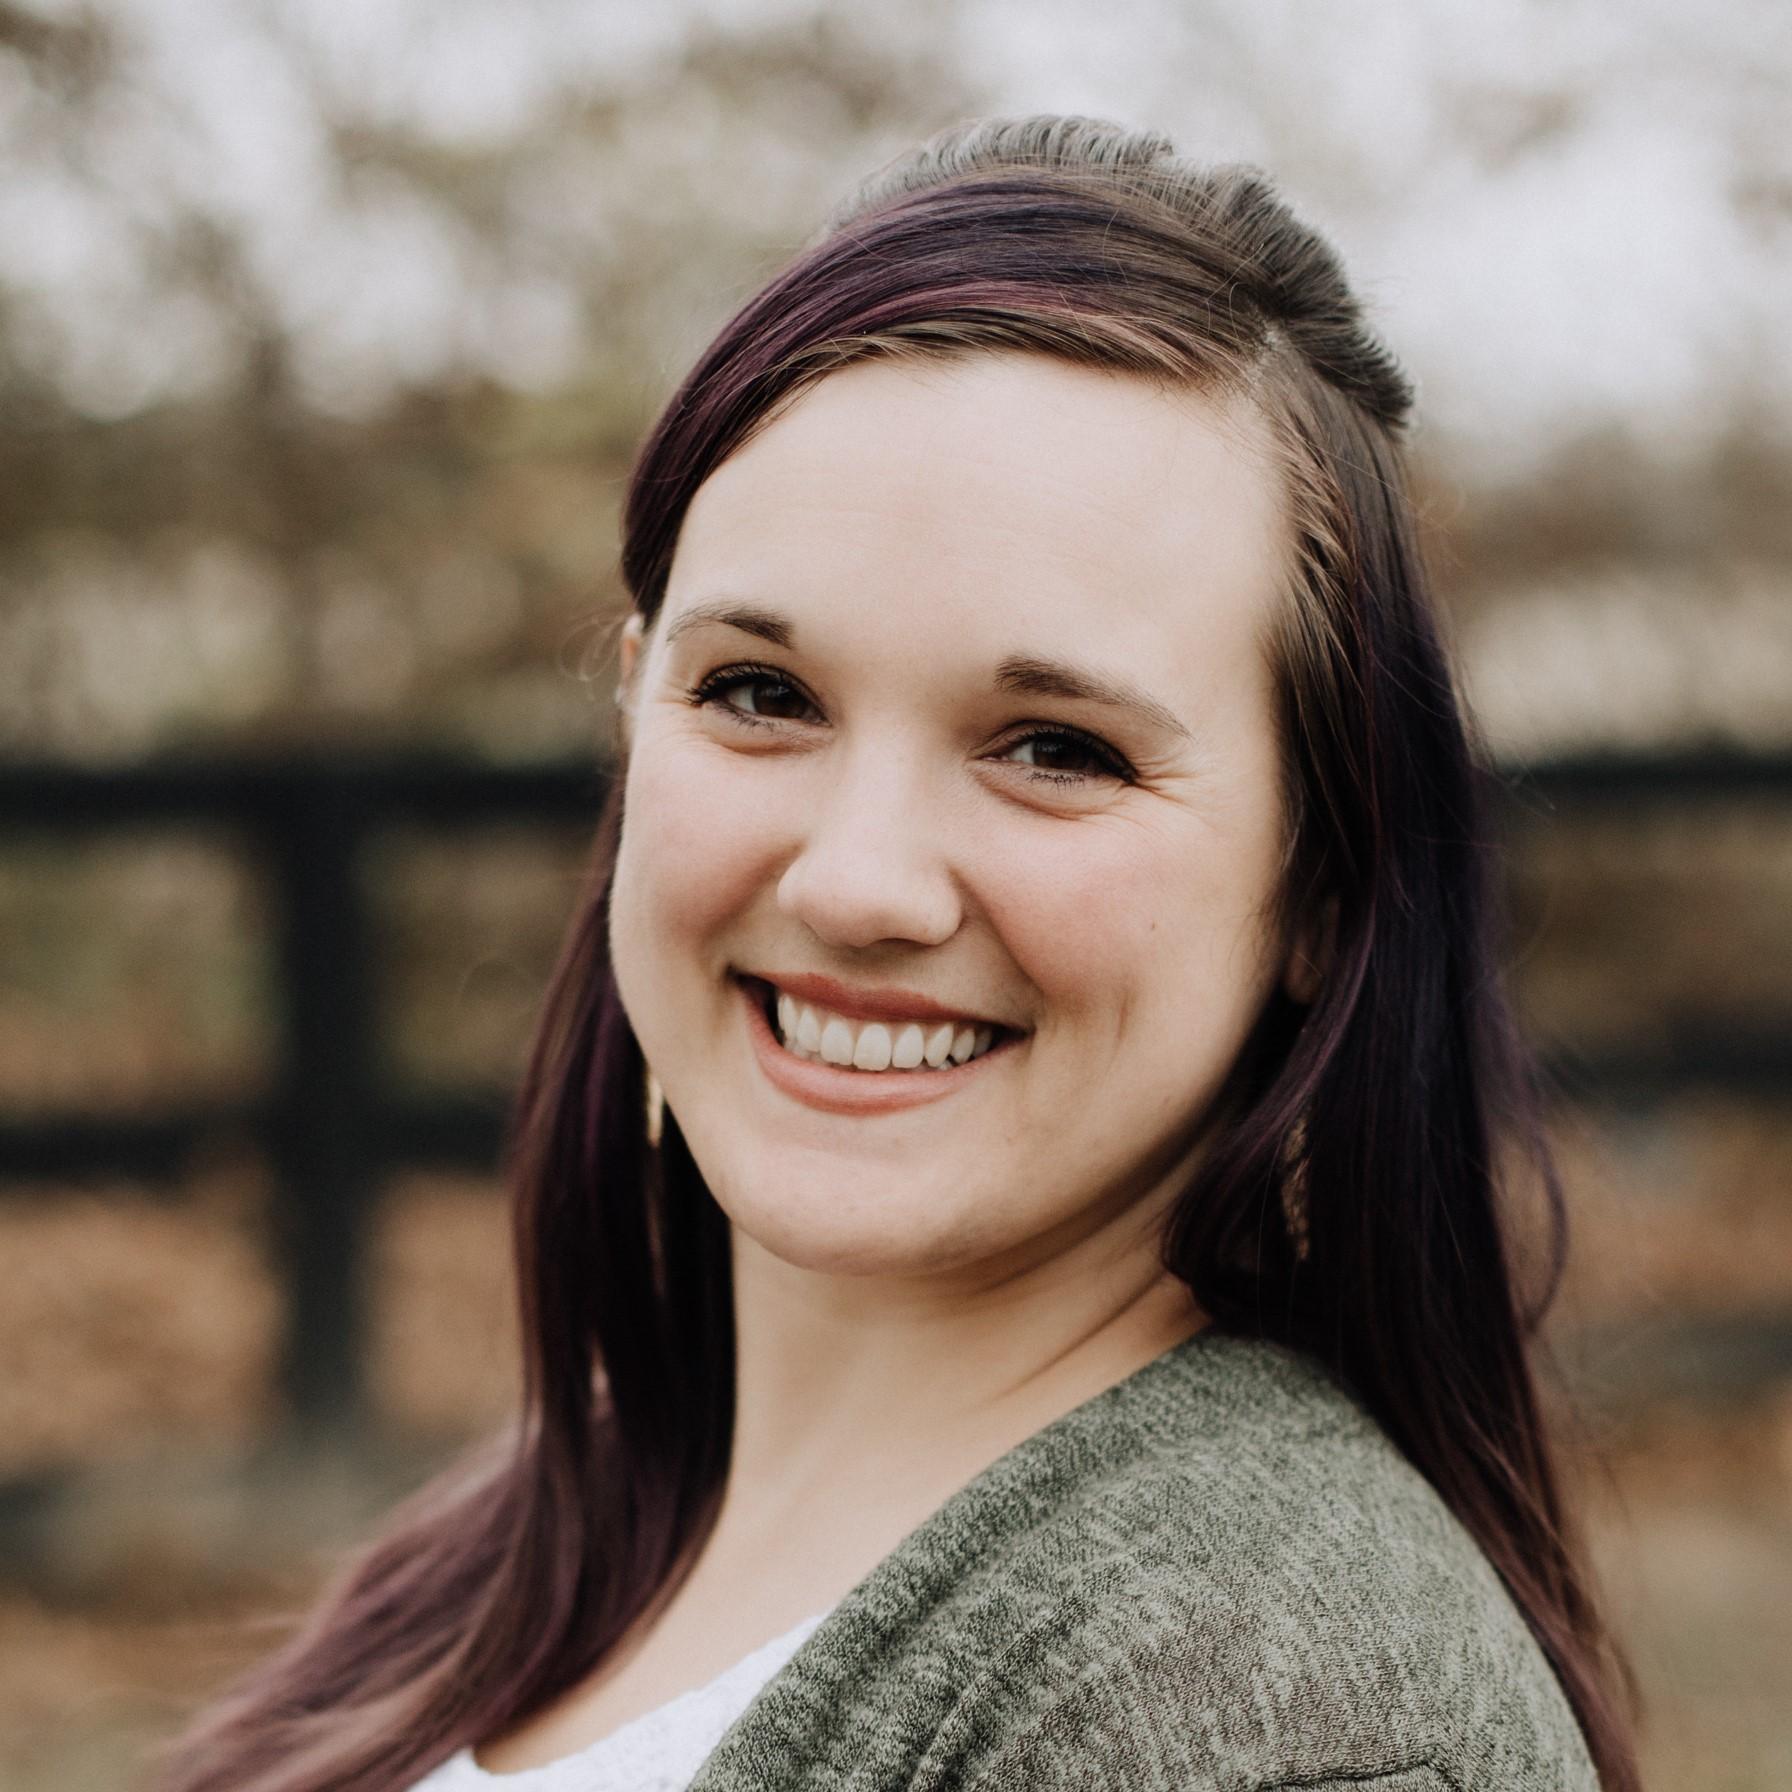 Kelsie Becker